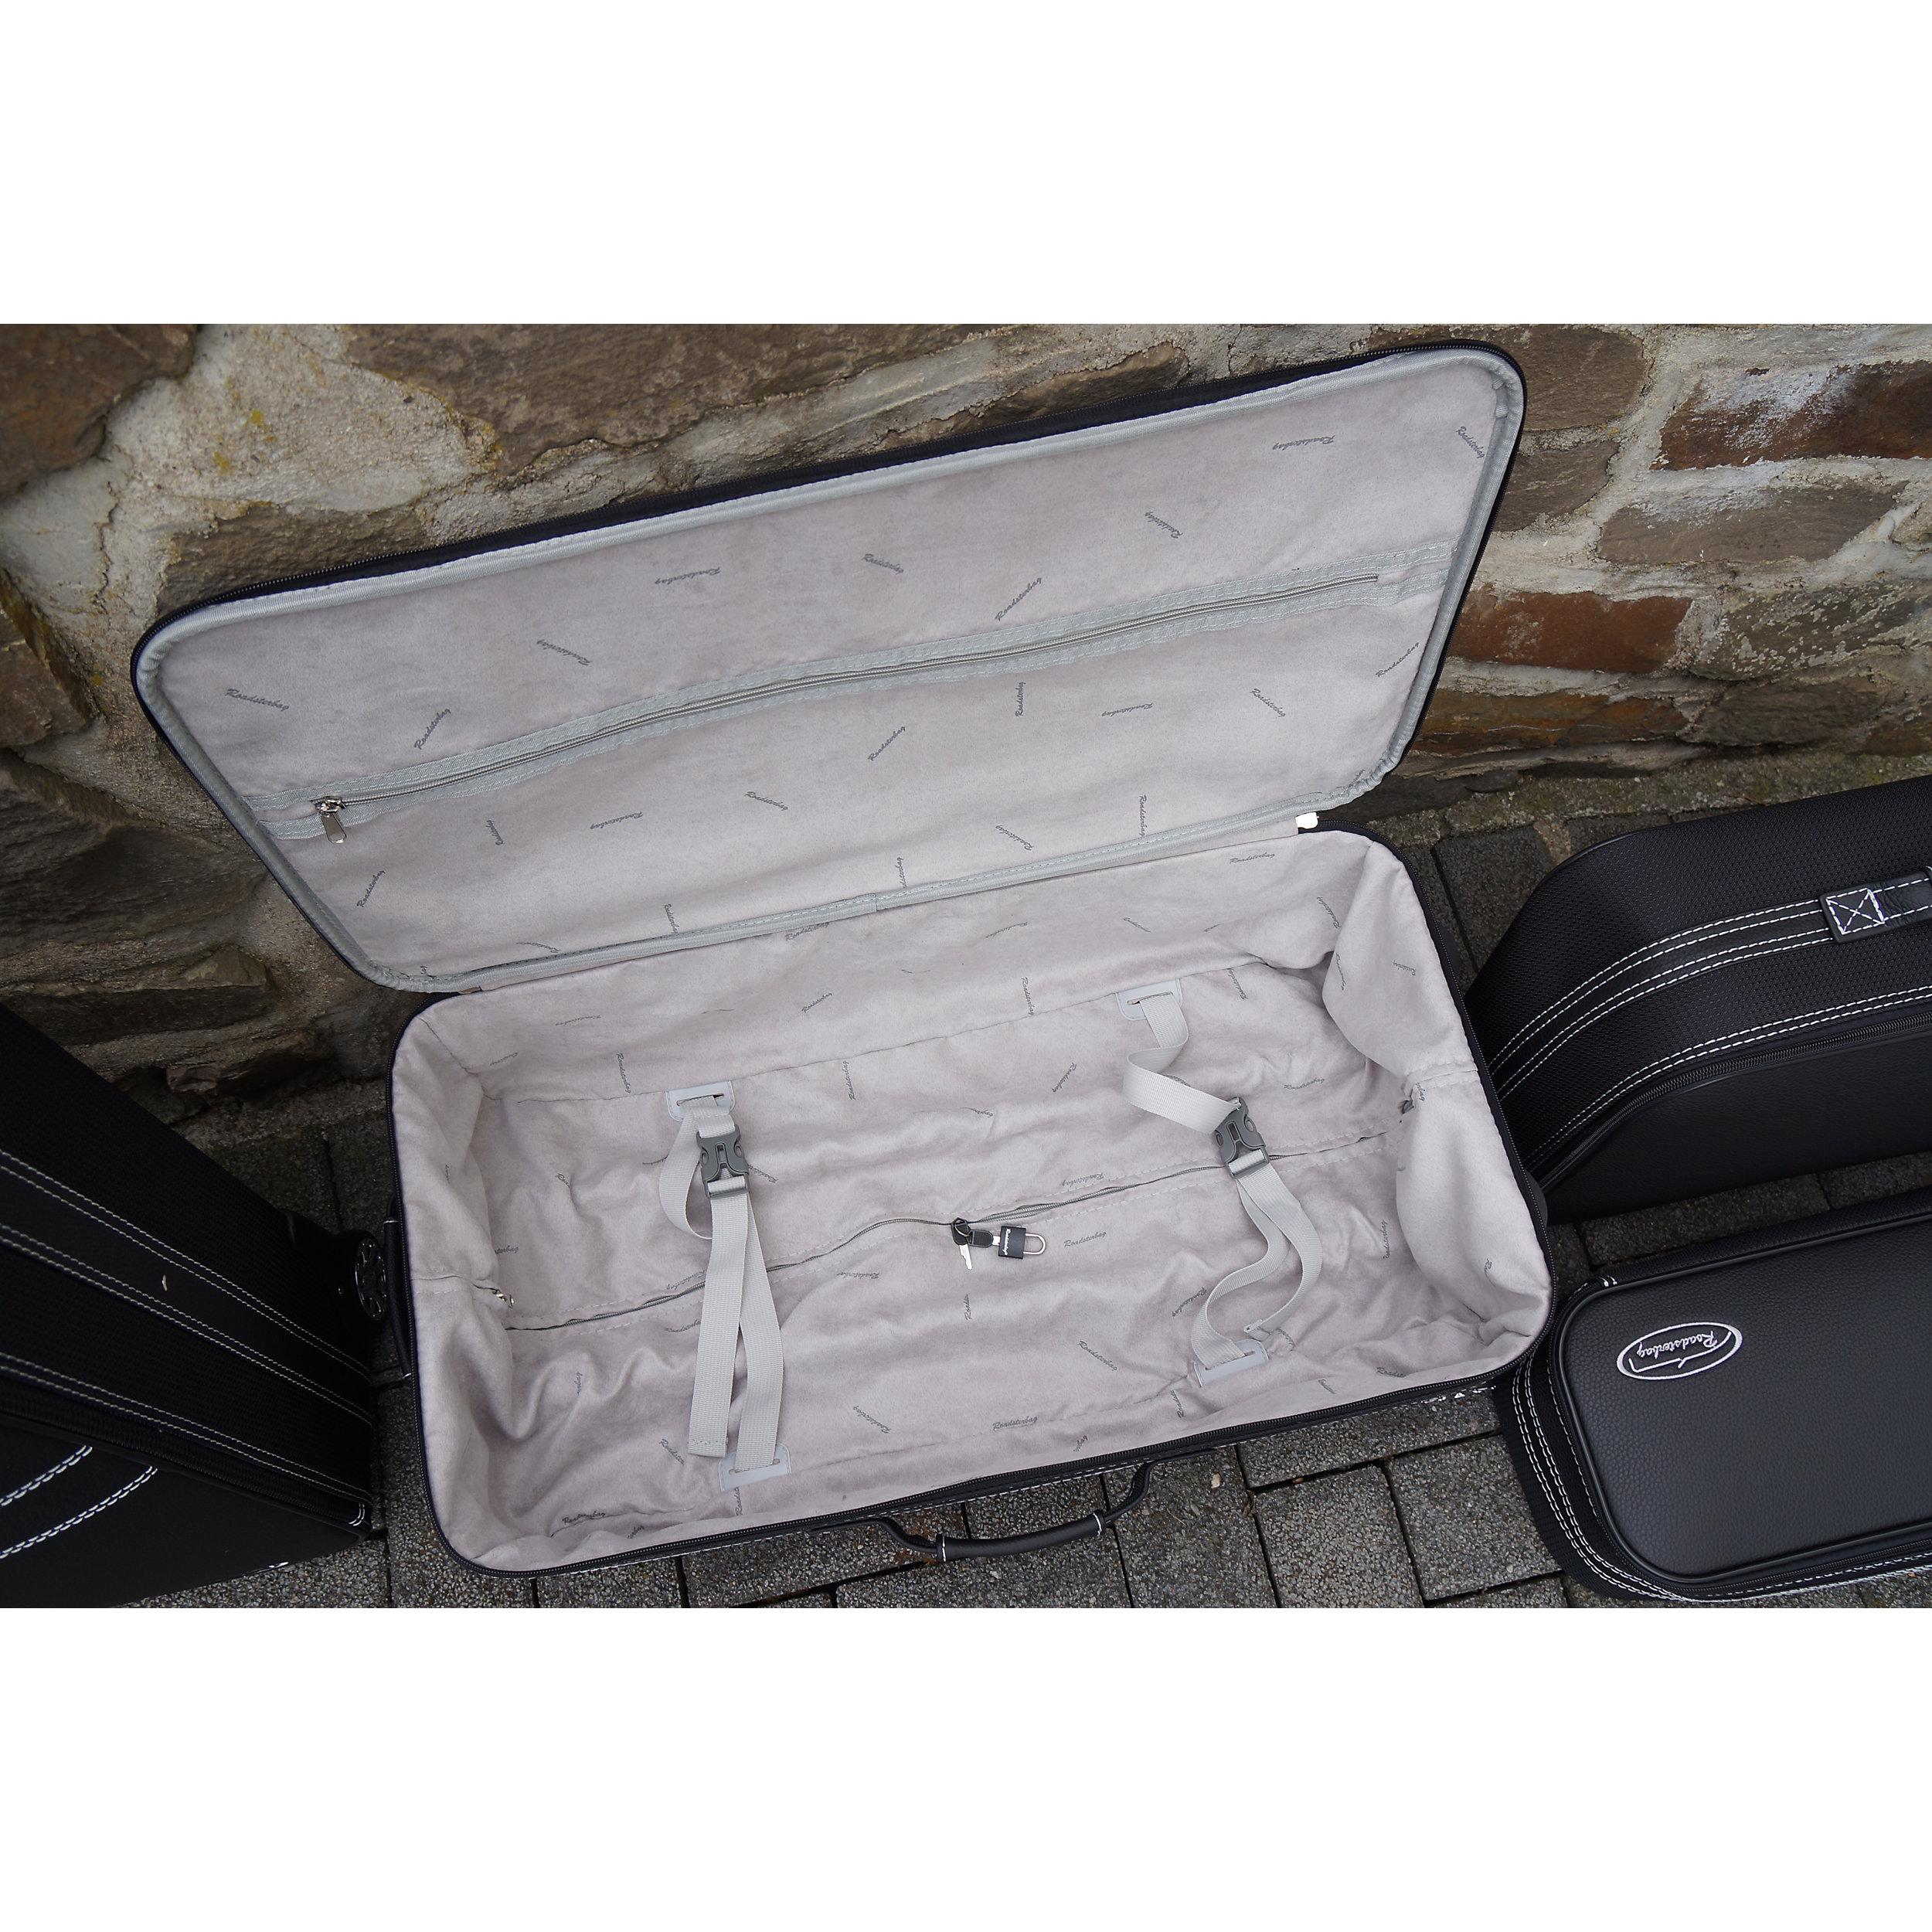 5-tlg. Kofferset mit 2 Rollen Mercedes E-Klasse Cabrio (A238)